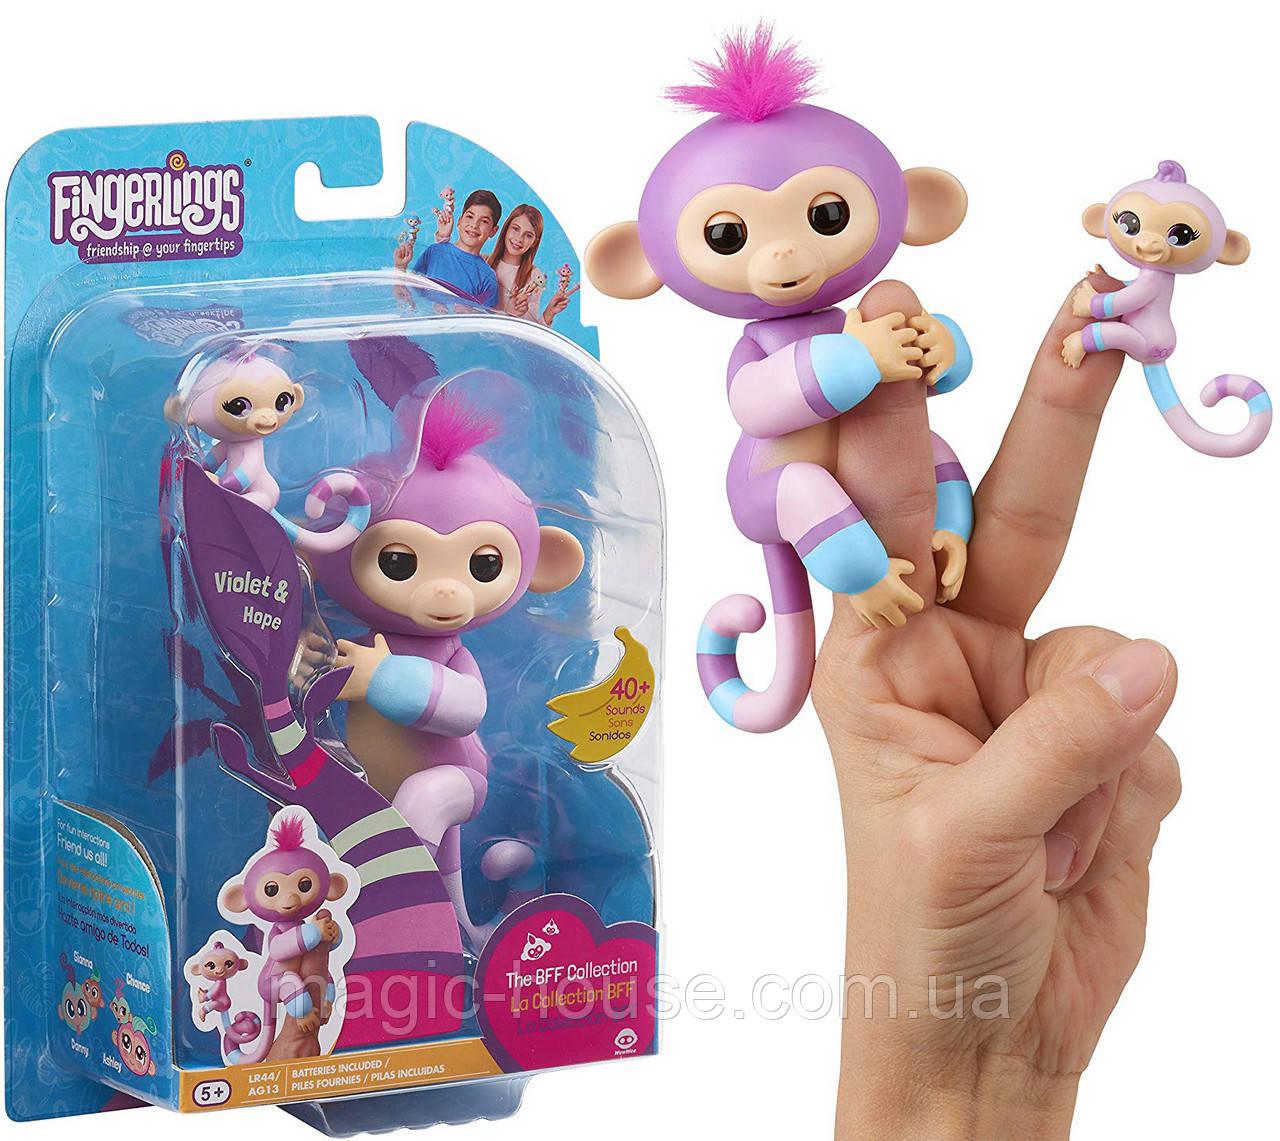 Интерактивная обезьянкаФингерлинг Виолета с малышкой Хопи ОригиналFingerlings Baby Monkey Violet & Hope